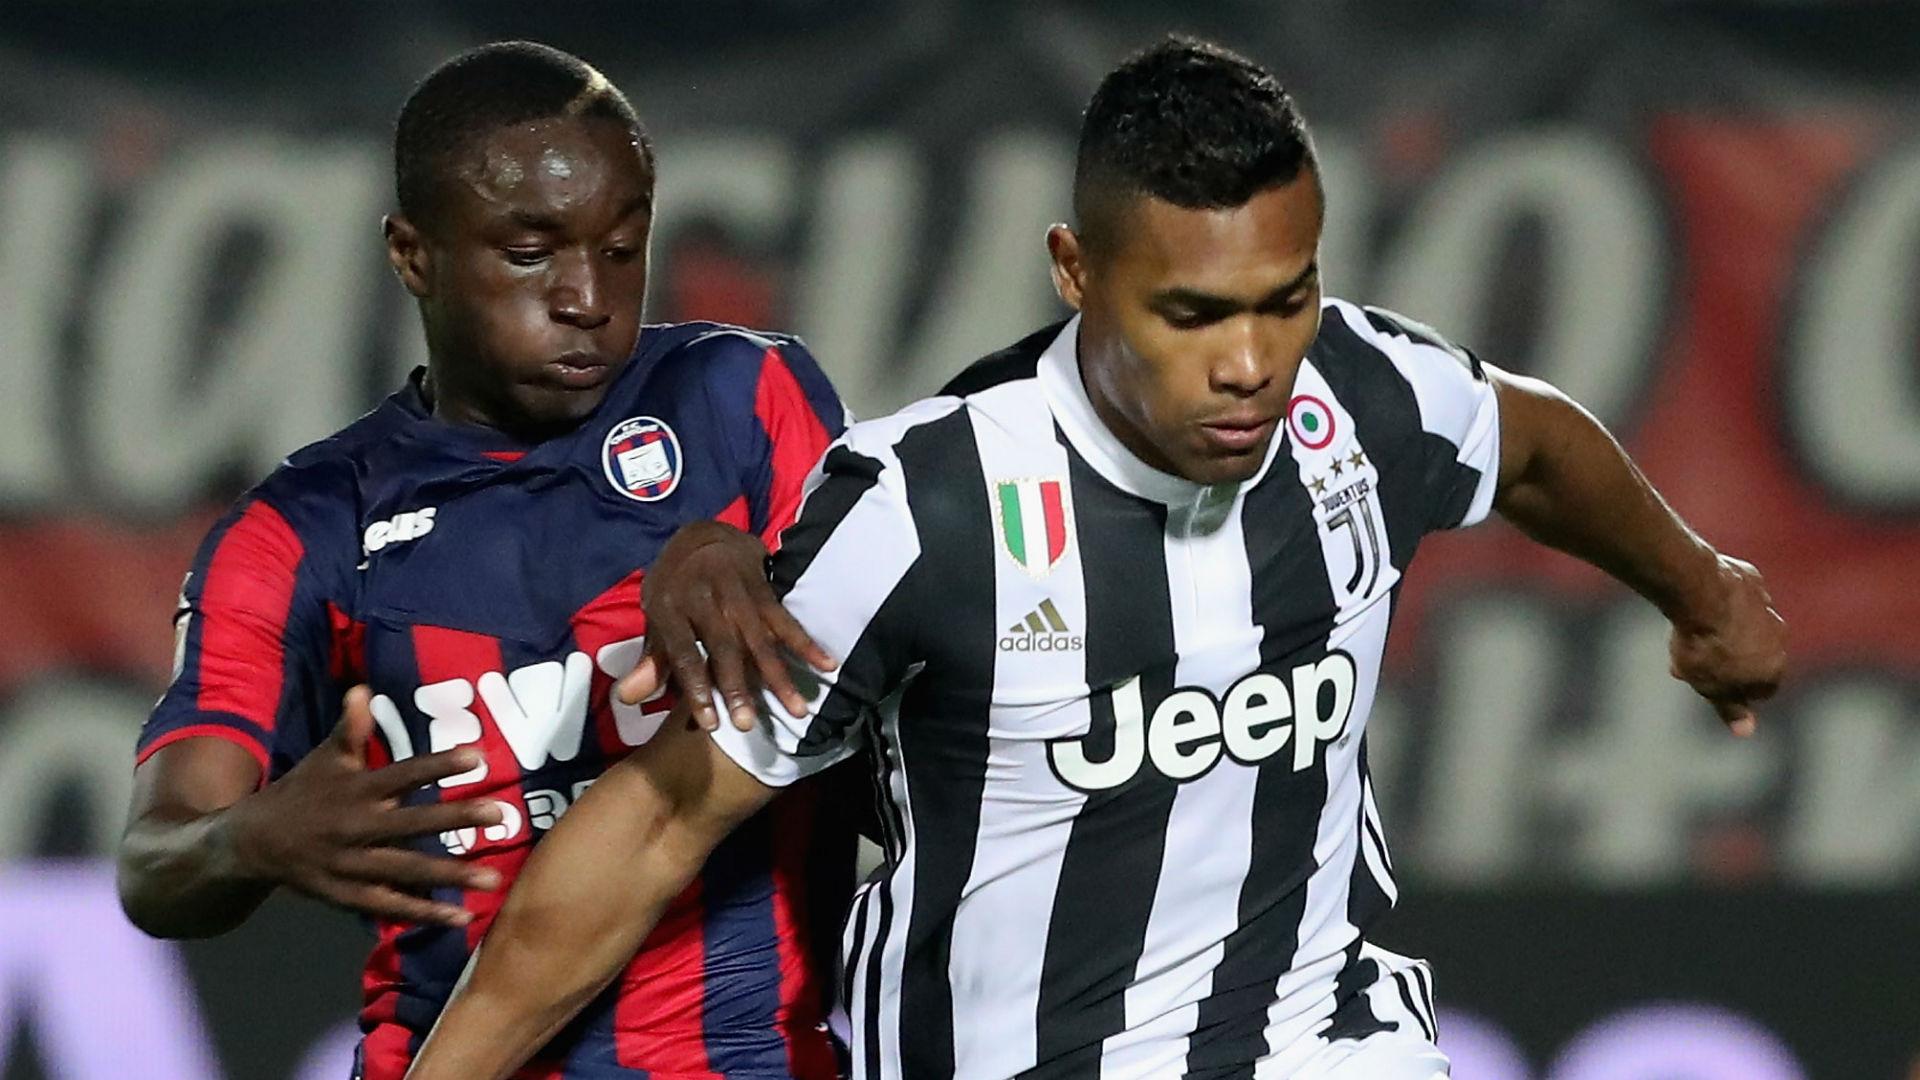 Diaby Crotone Alex Sandro Juventus Serie A